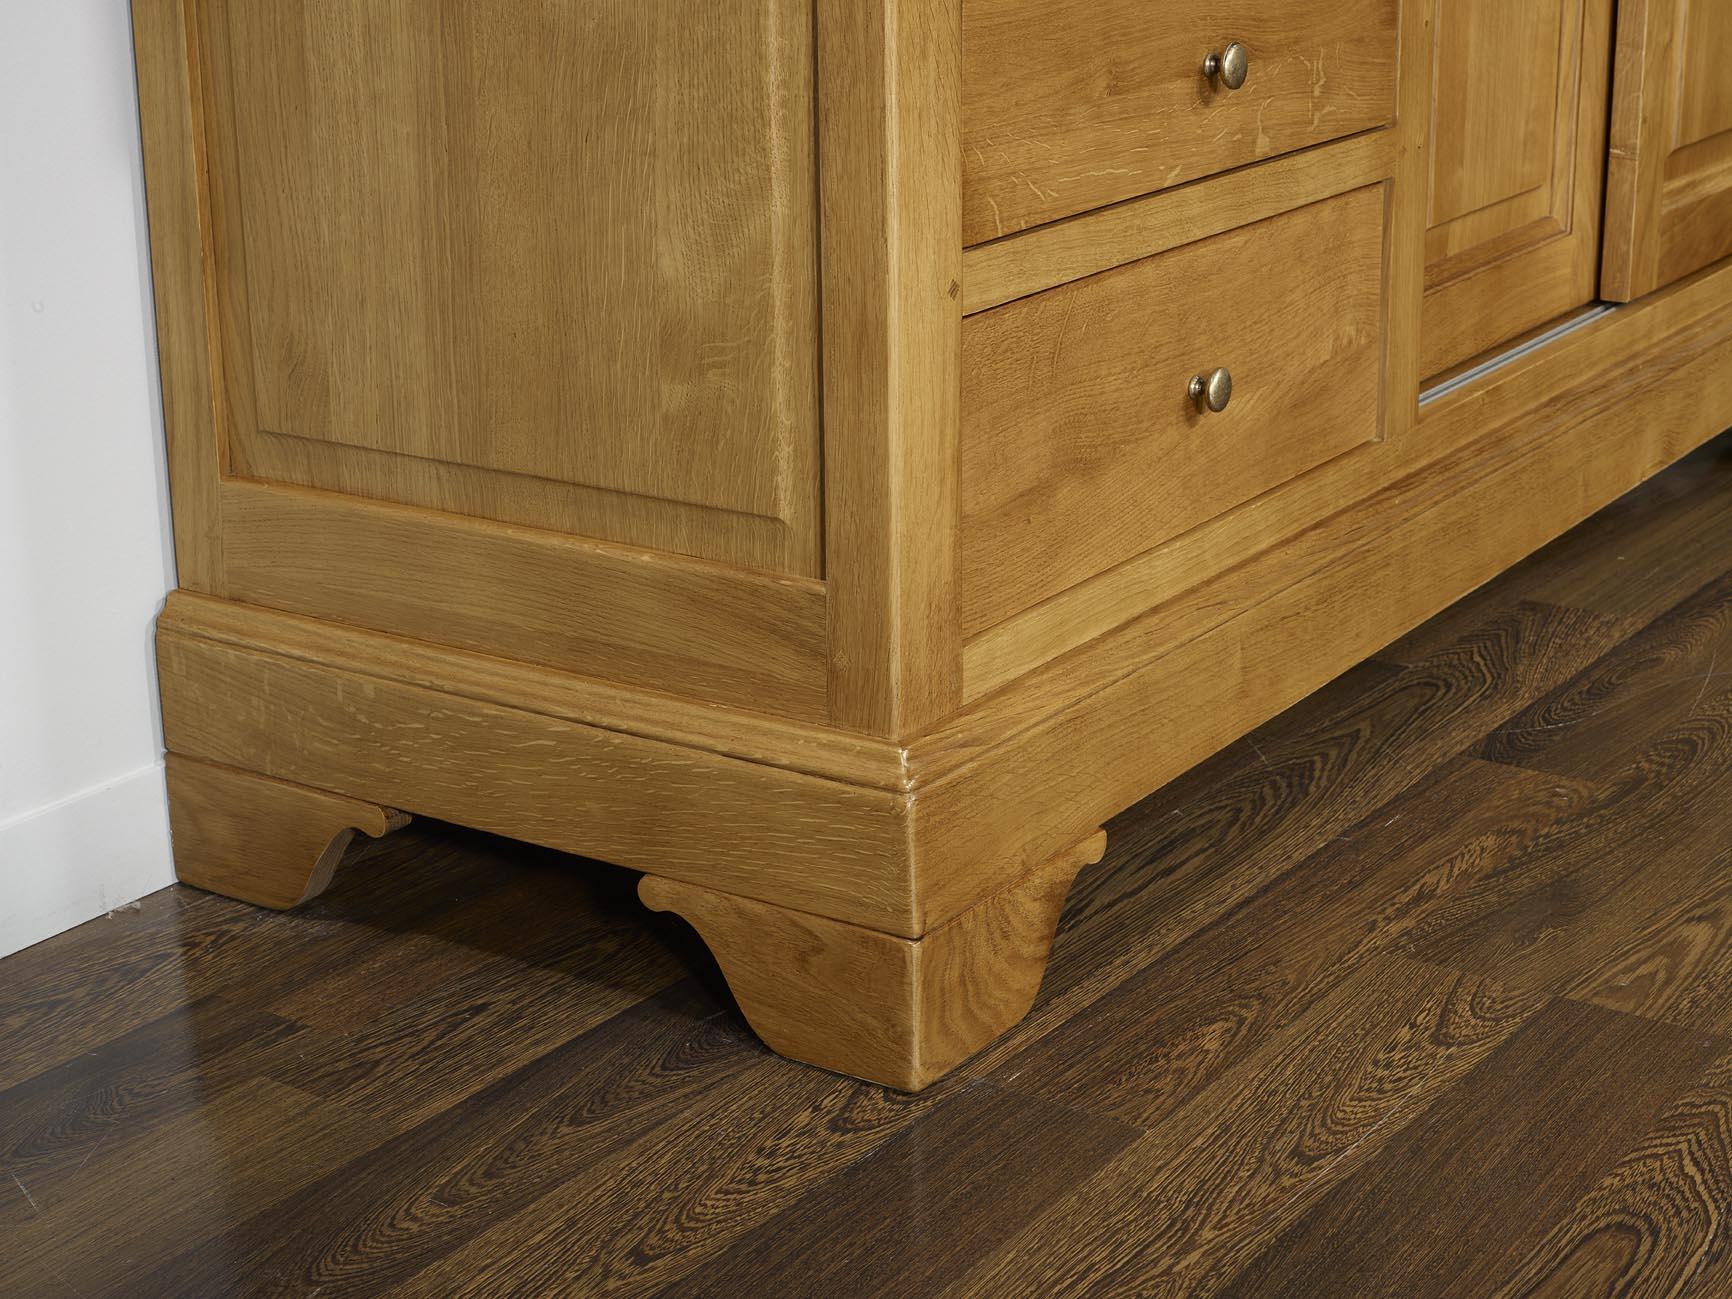 Mueble tv arnaldo en madera maciza de roble estilo louis - Muebles de madera de roble ...